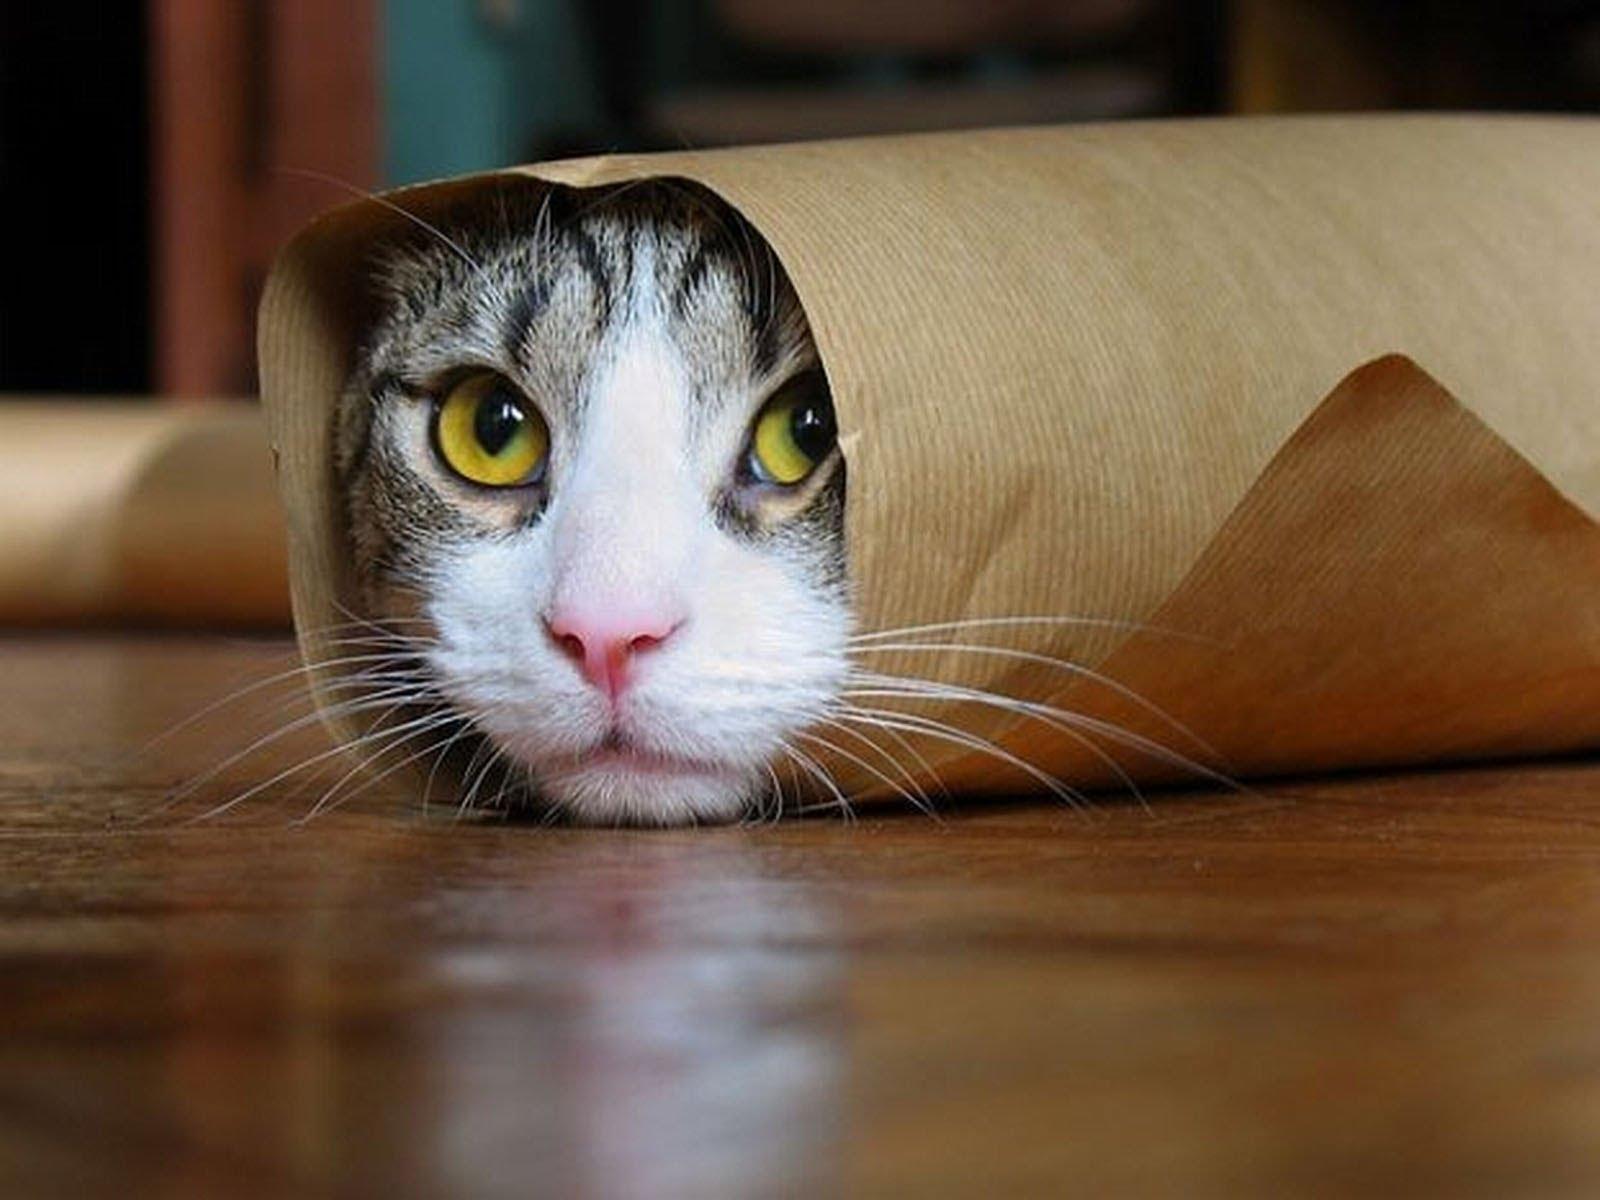 013-that-s-one-greedy-kitty-2554895.jpg